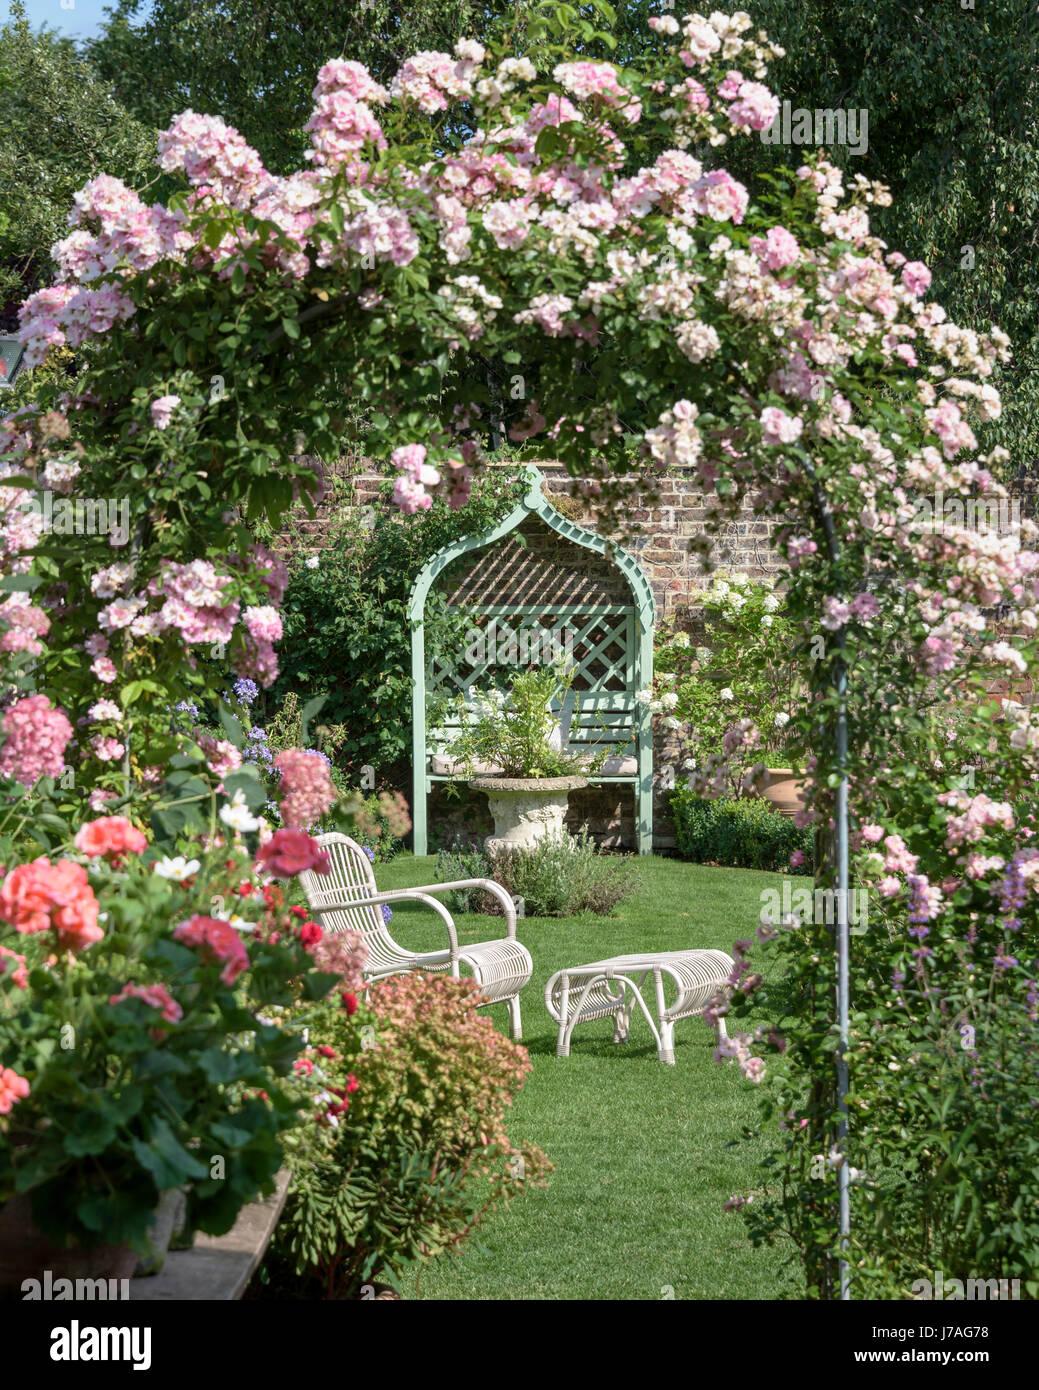 Wicker Garden Furniture Seen Through A Rose Arch In An English